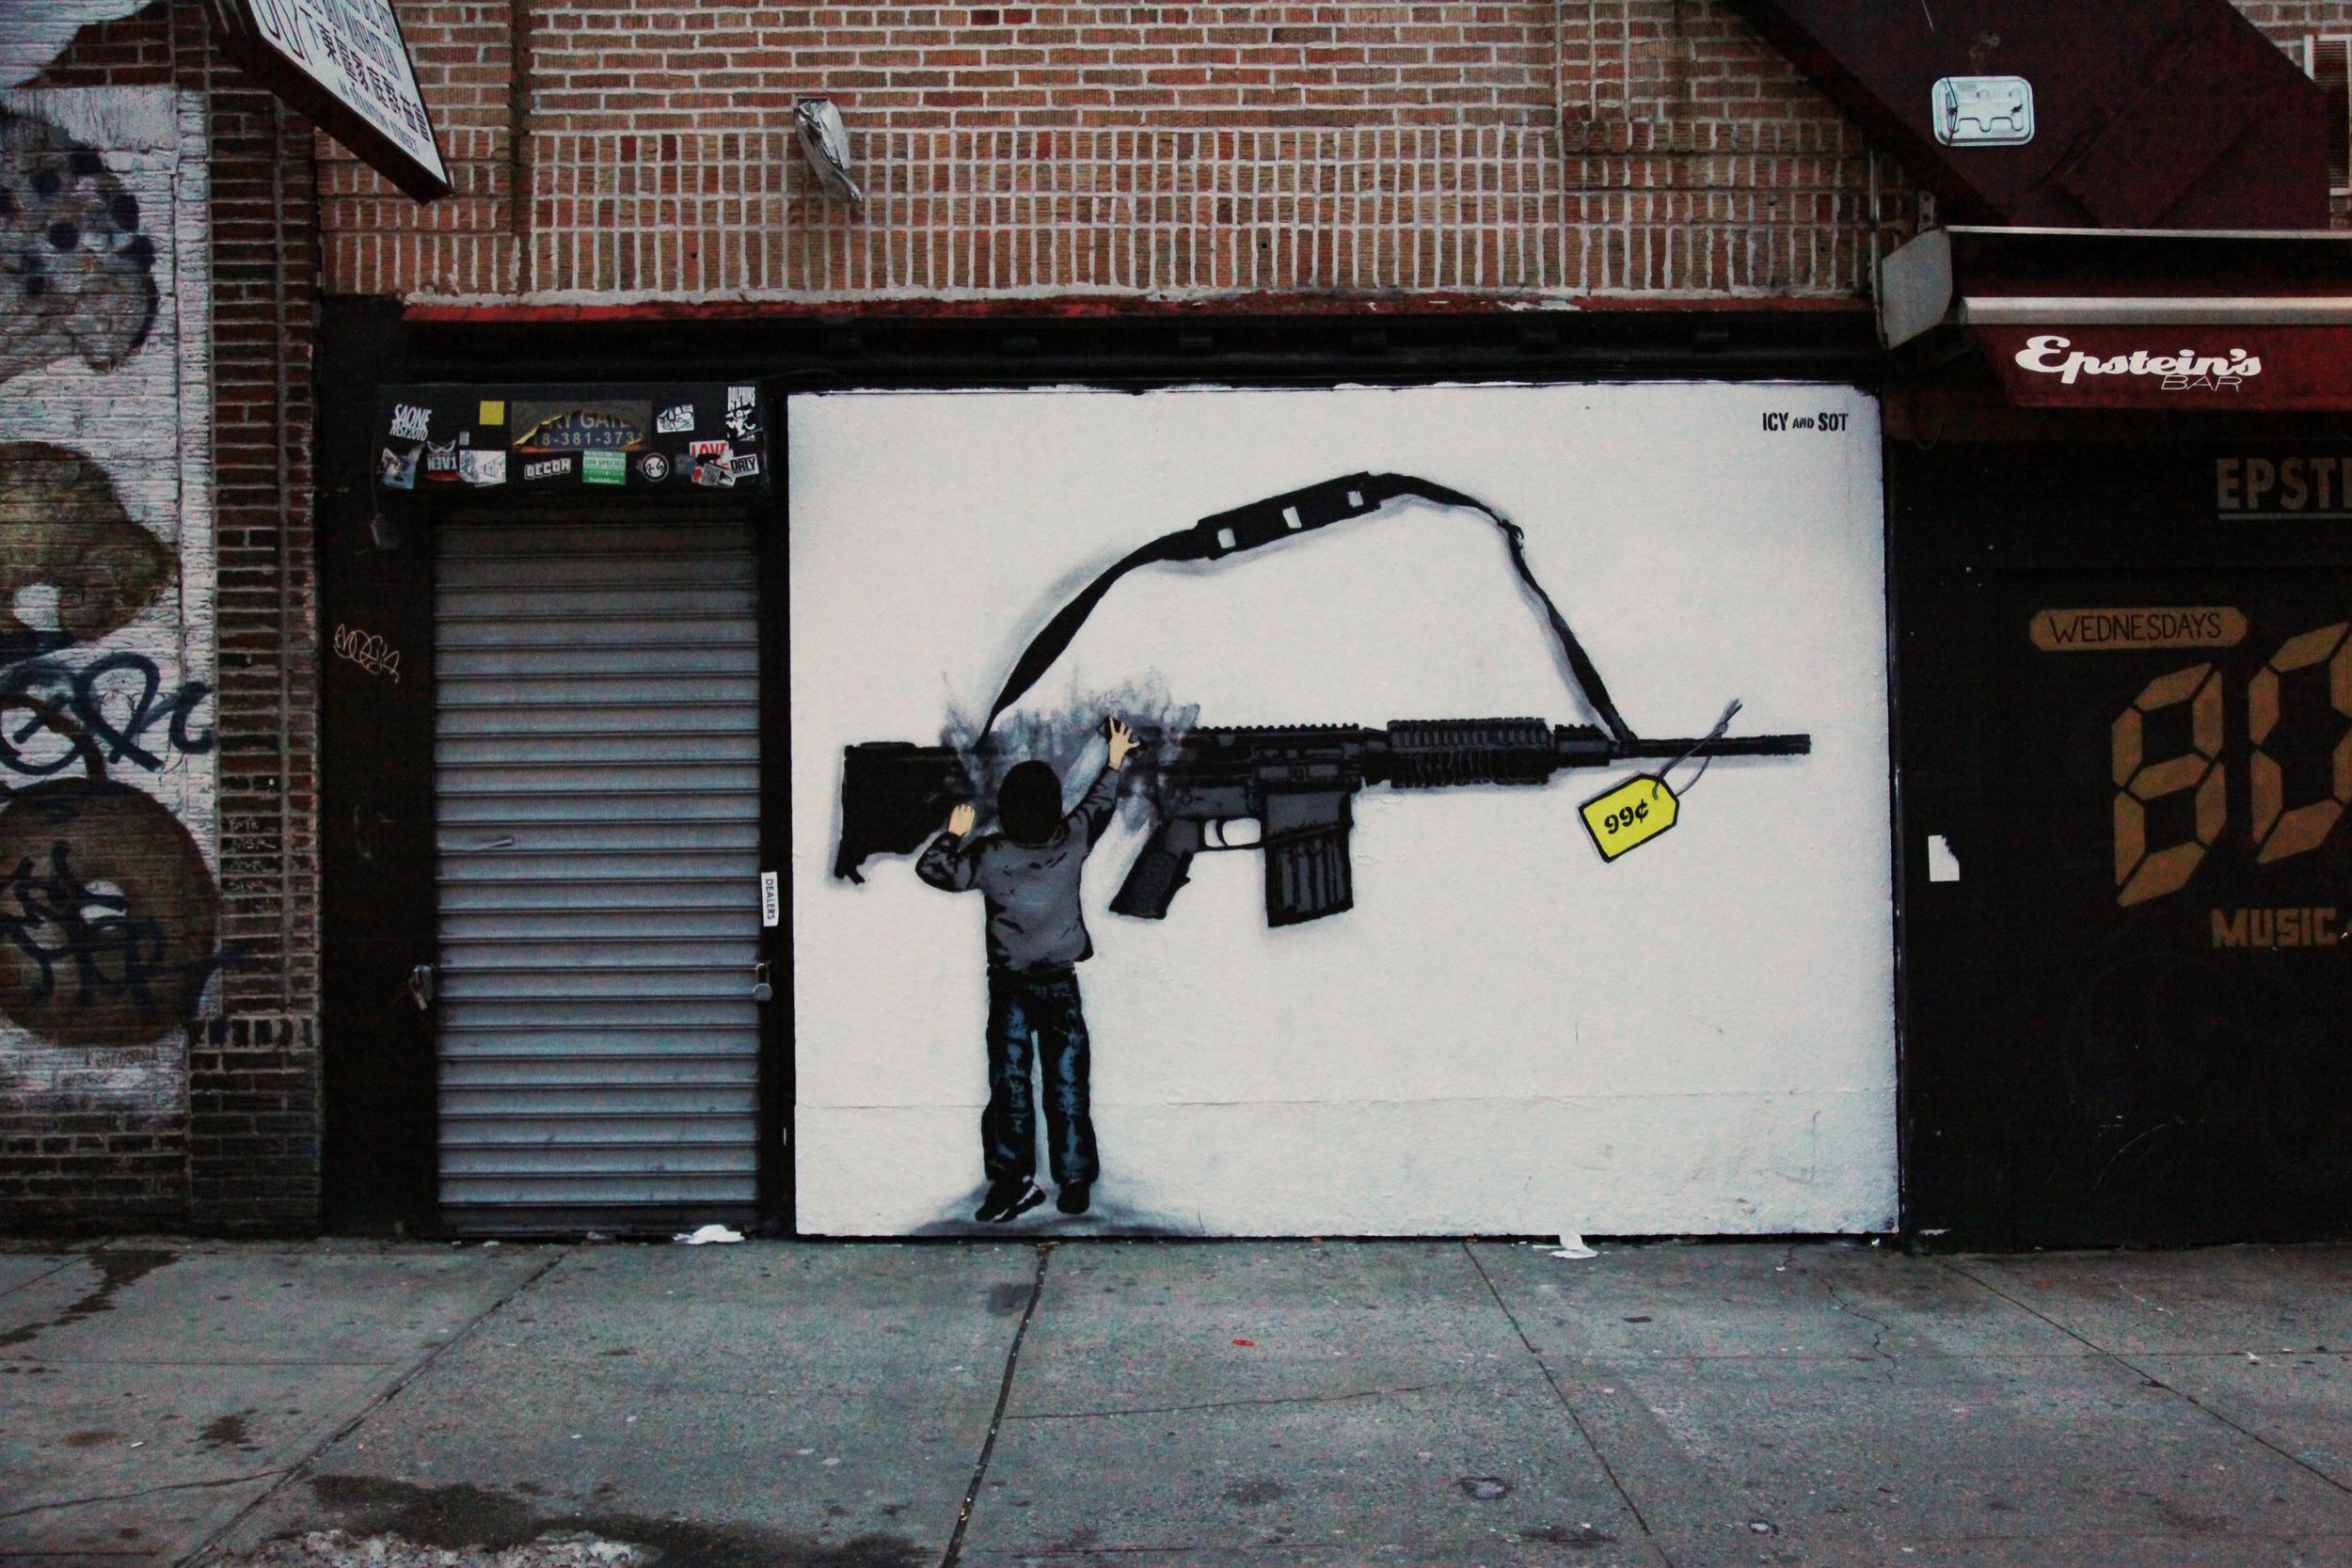 brooklyn-street-art-icy-sot-jaime-rojo-book-06-15 -highrez- 89.jpg